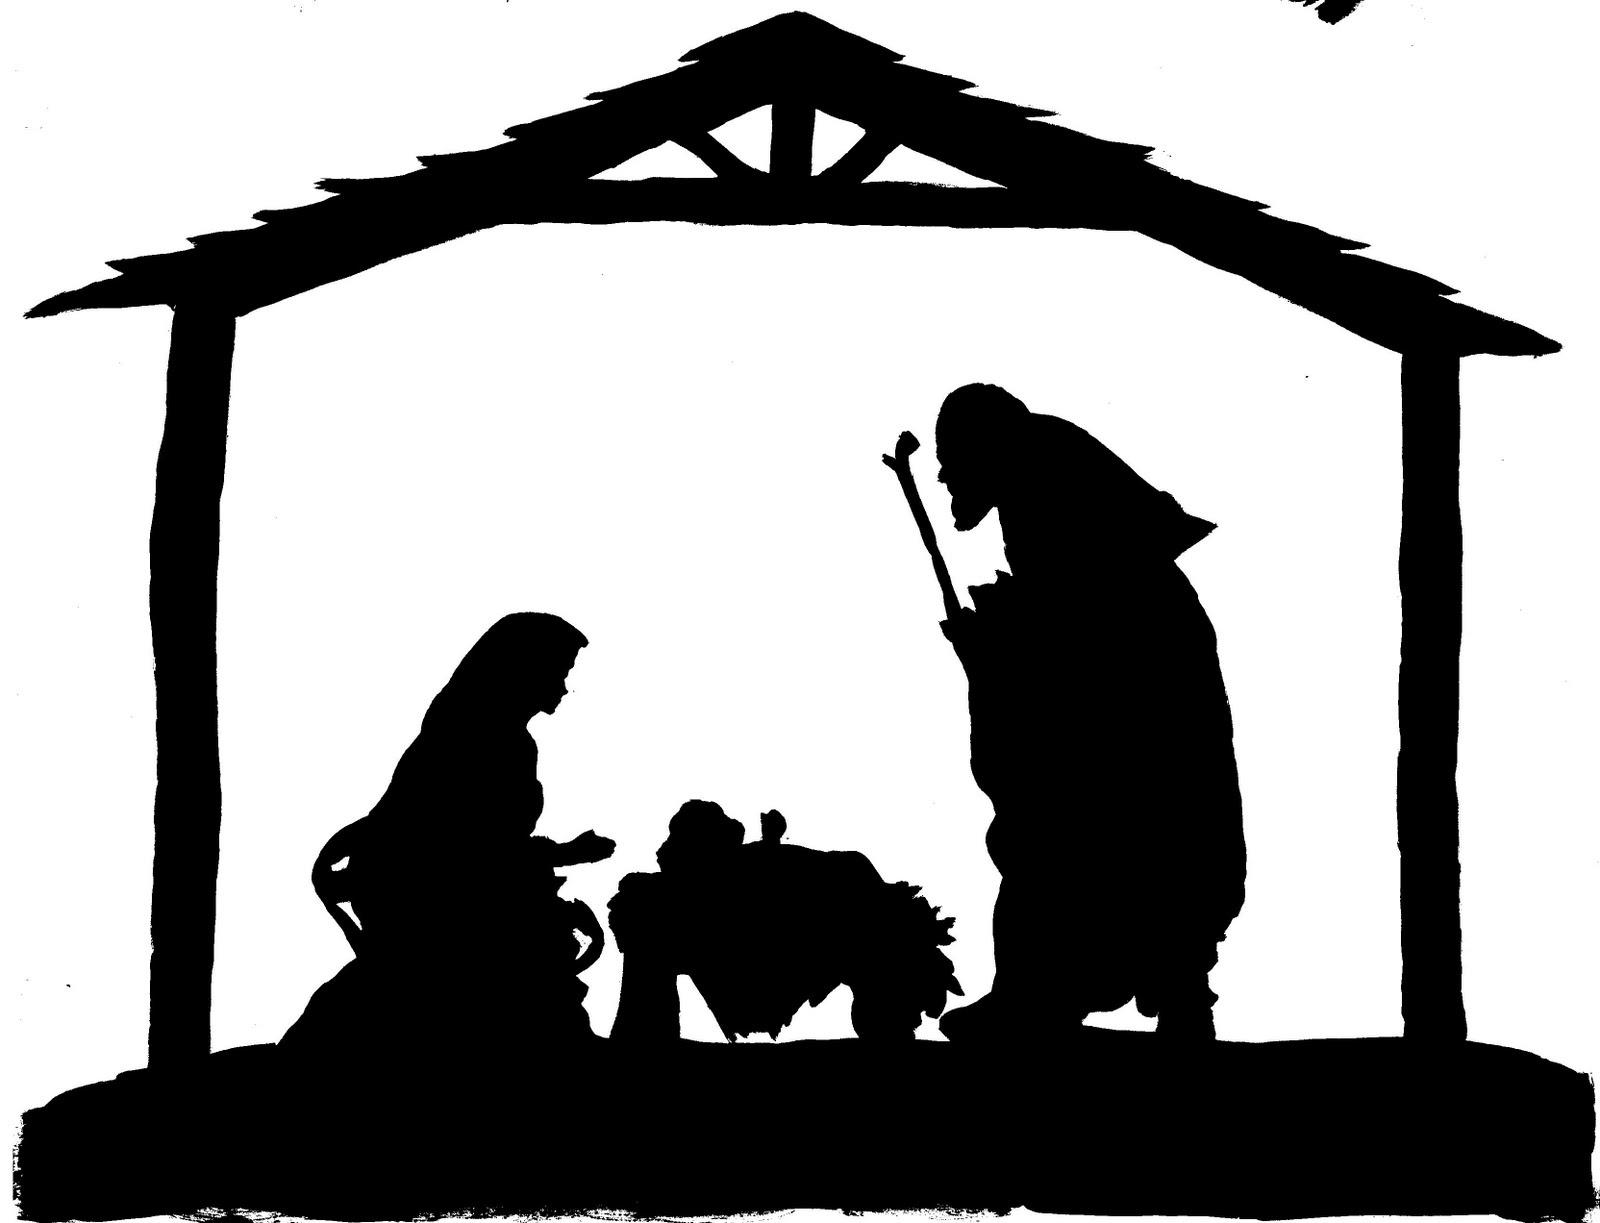 Nativity Silhouette Free Nativity Silhouette Clipart - Wikiclipart - Free Printable Nativity Silhouette